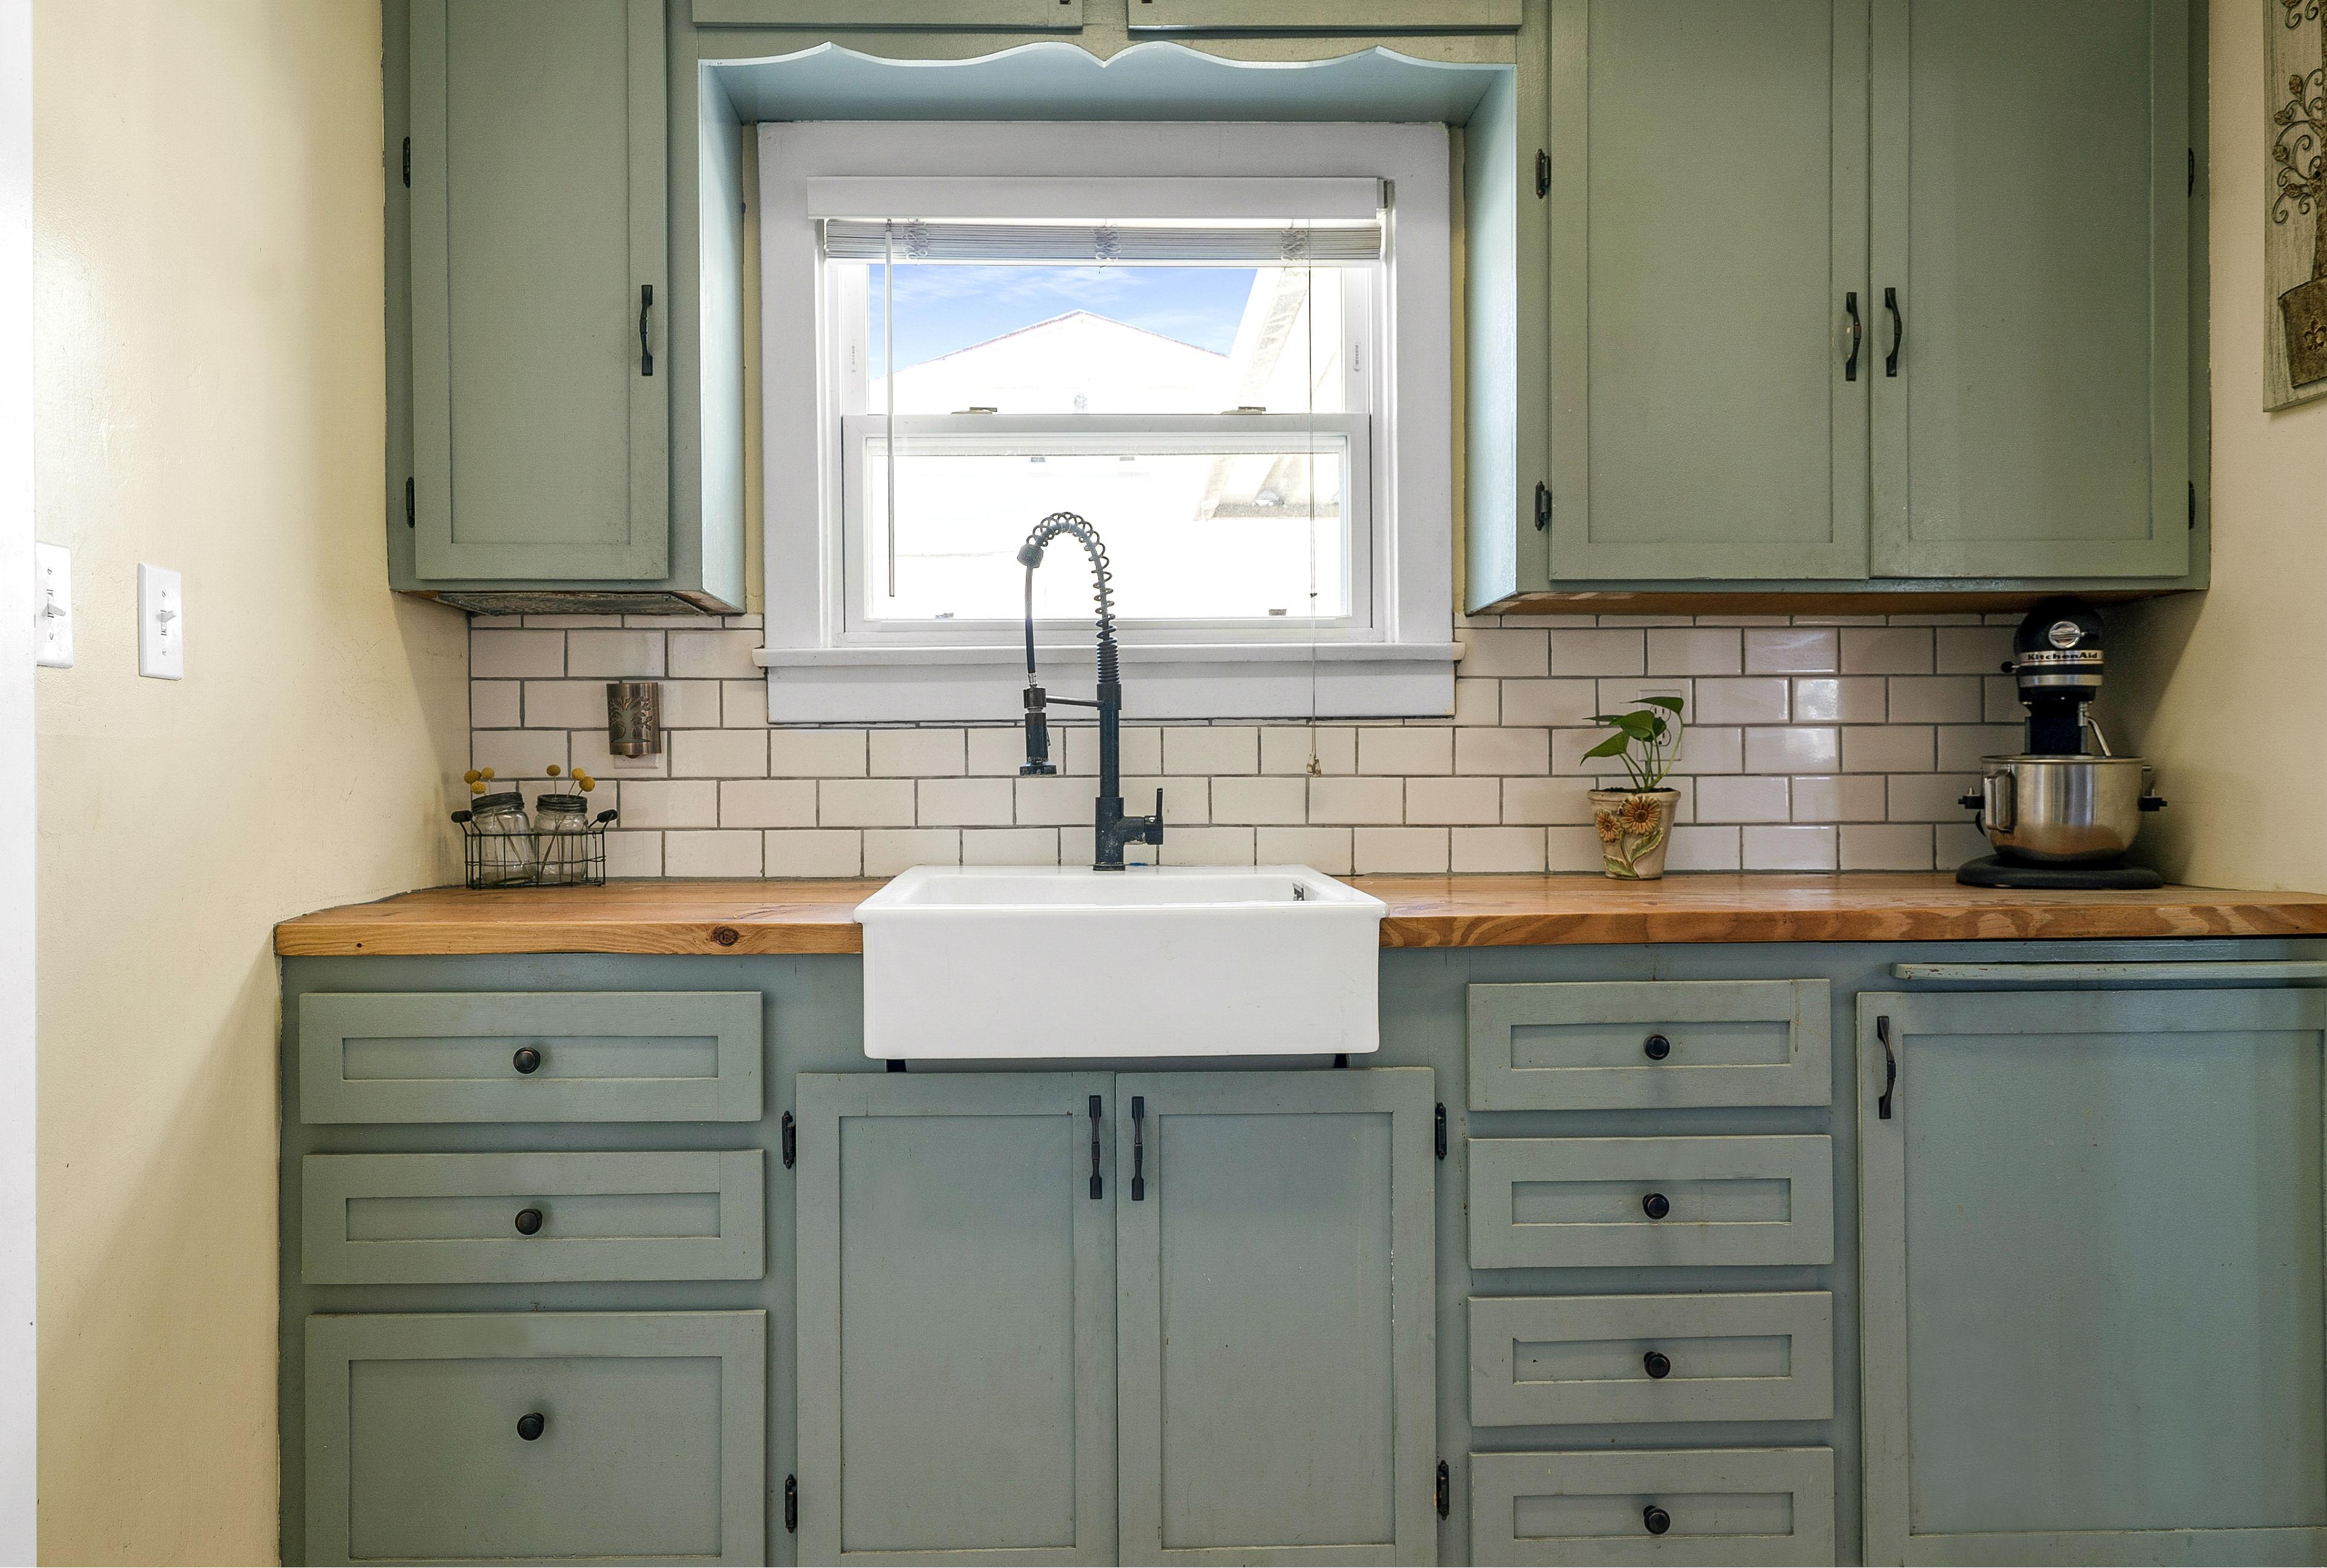 Practical farm sink in the kitchen.